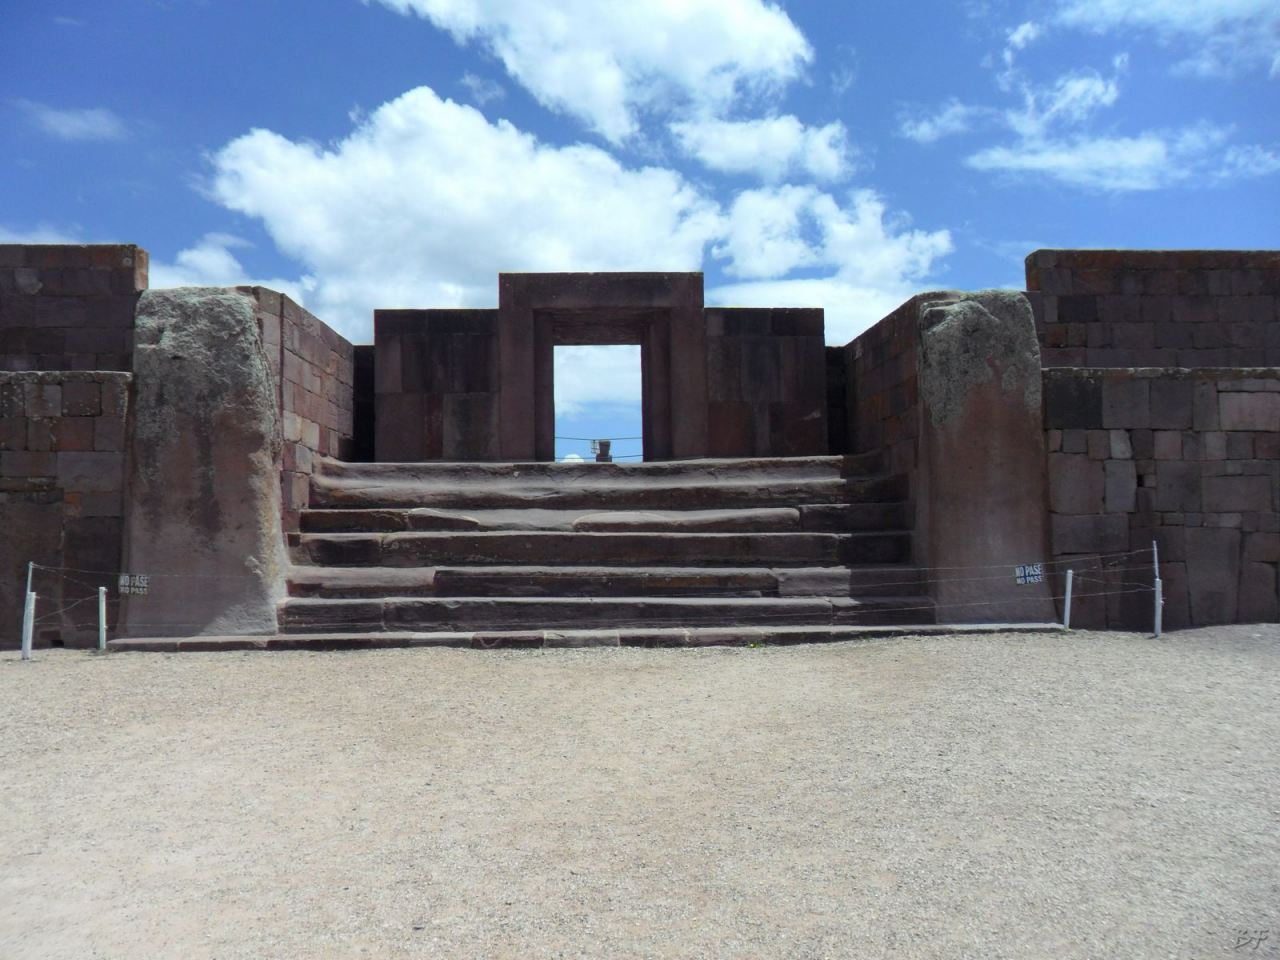 Sito-Megalitico-Piramide-Akapana-Kalasasaya-Menhir-Tiahuanaco-Bolivia-70